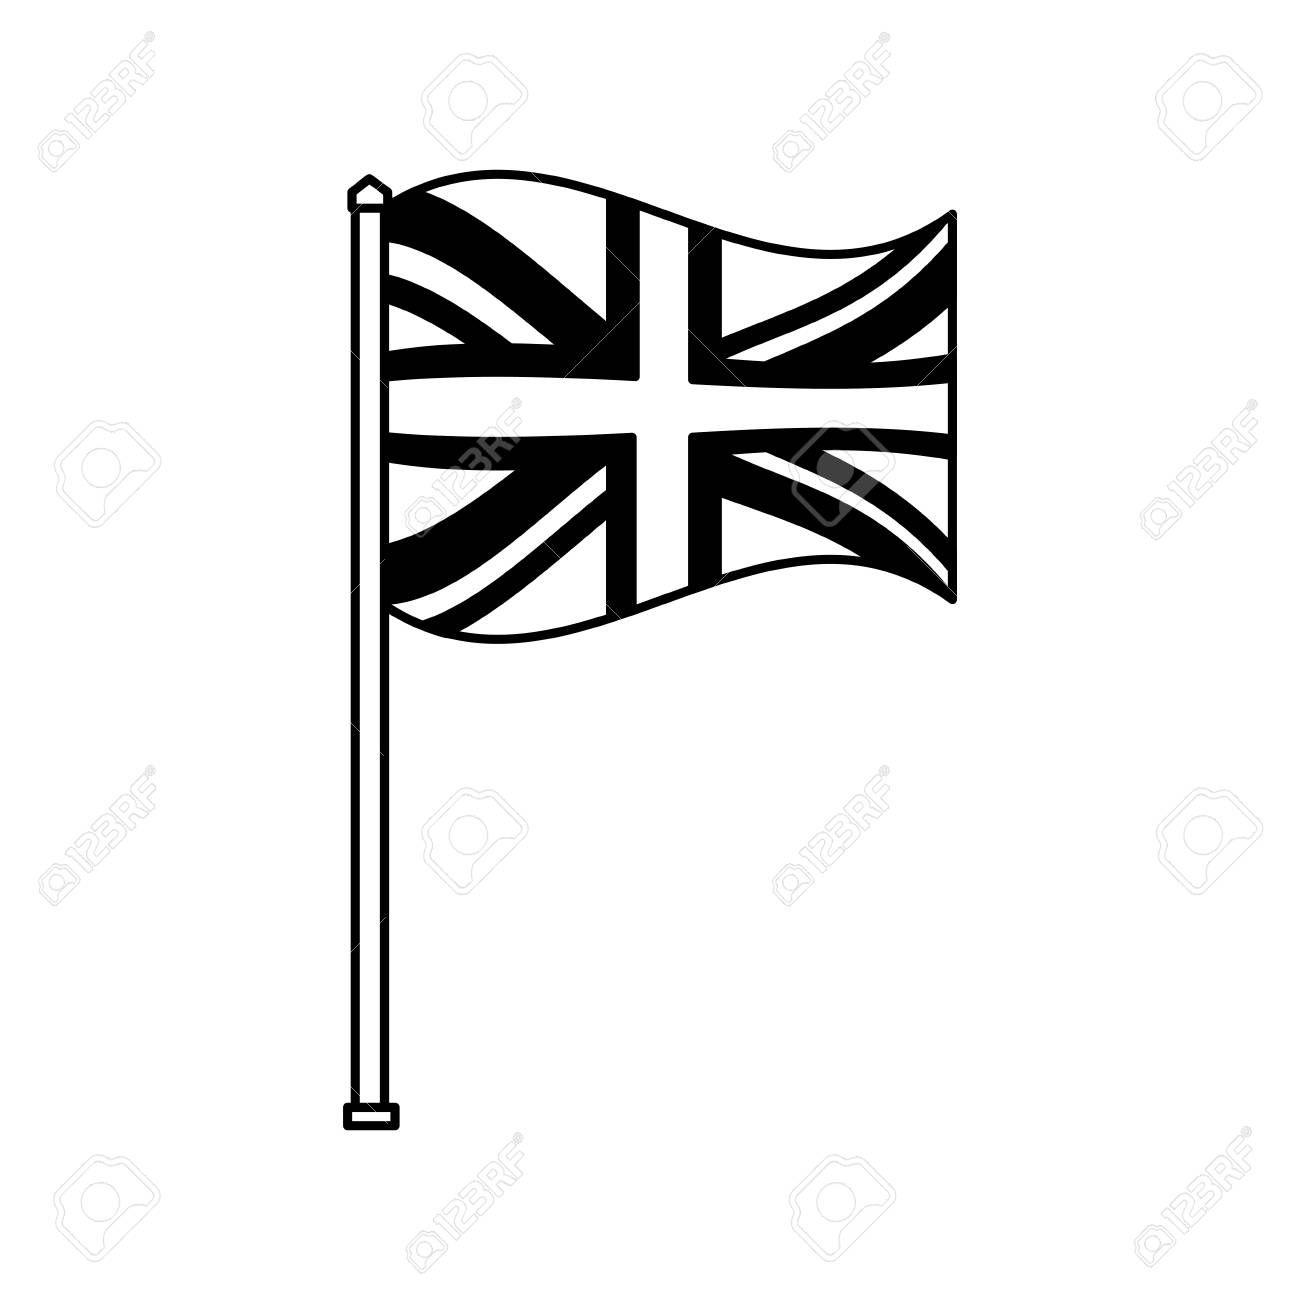 United Kingdom Flag In Pole National Symbol Vector Illustration Black And White Affiliate Pole N United Kingdom Flag National Symbols Design Inspiration